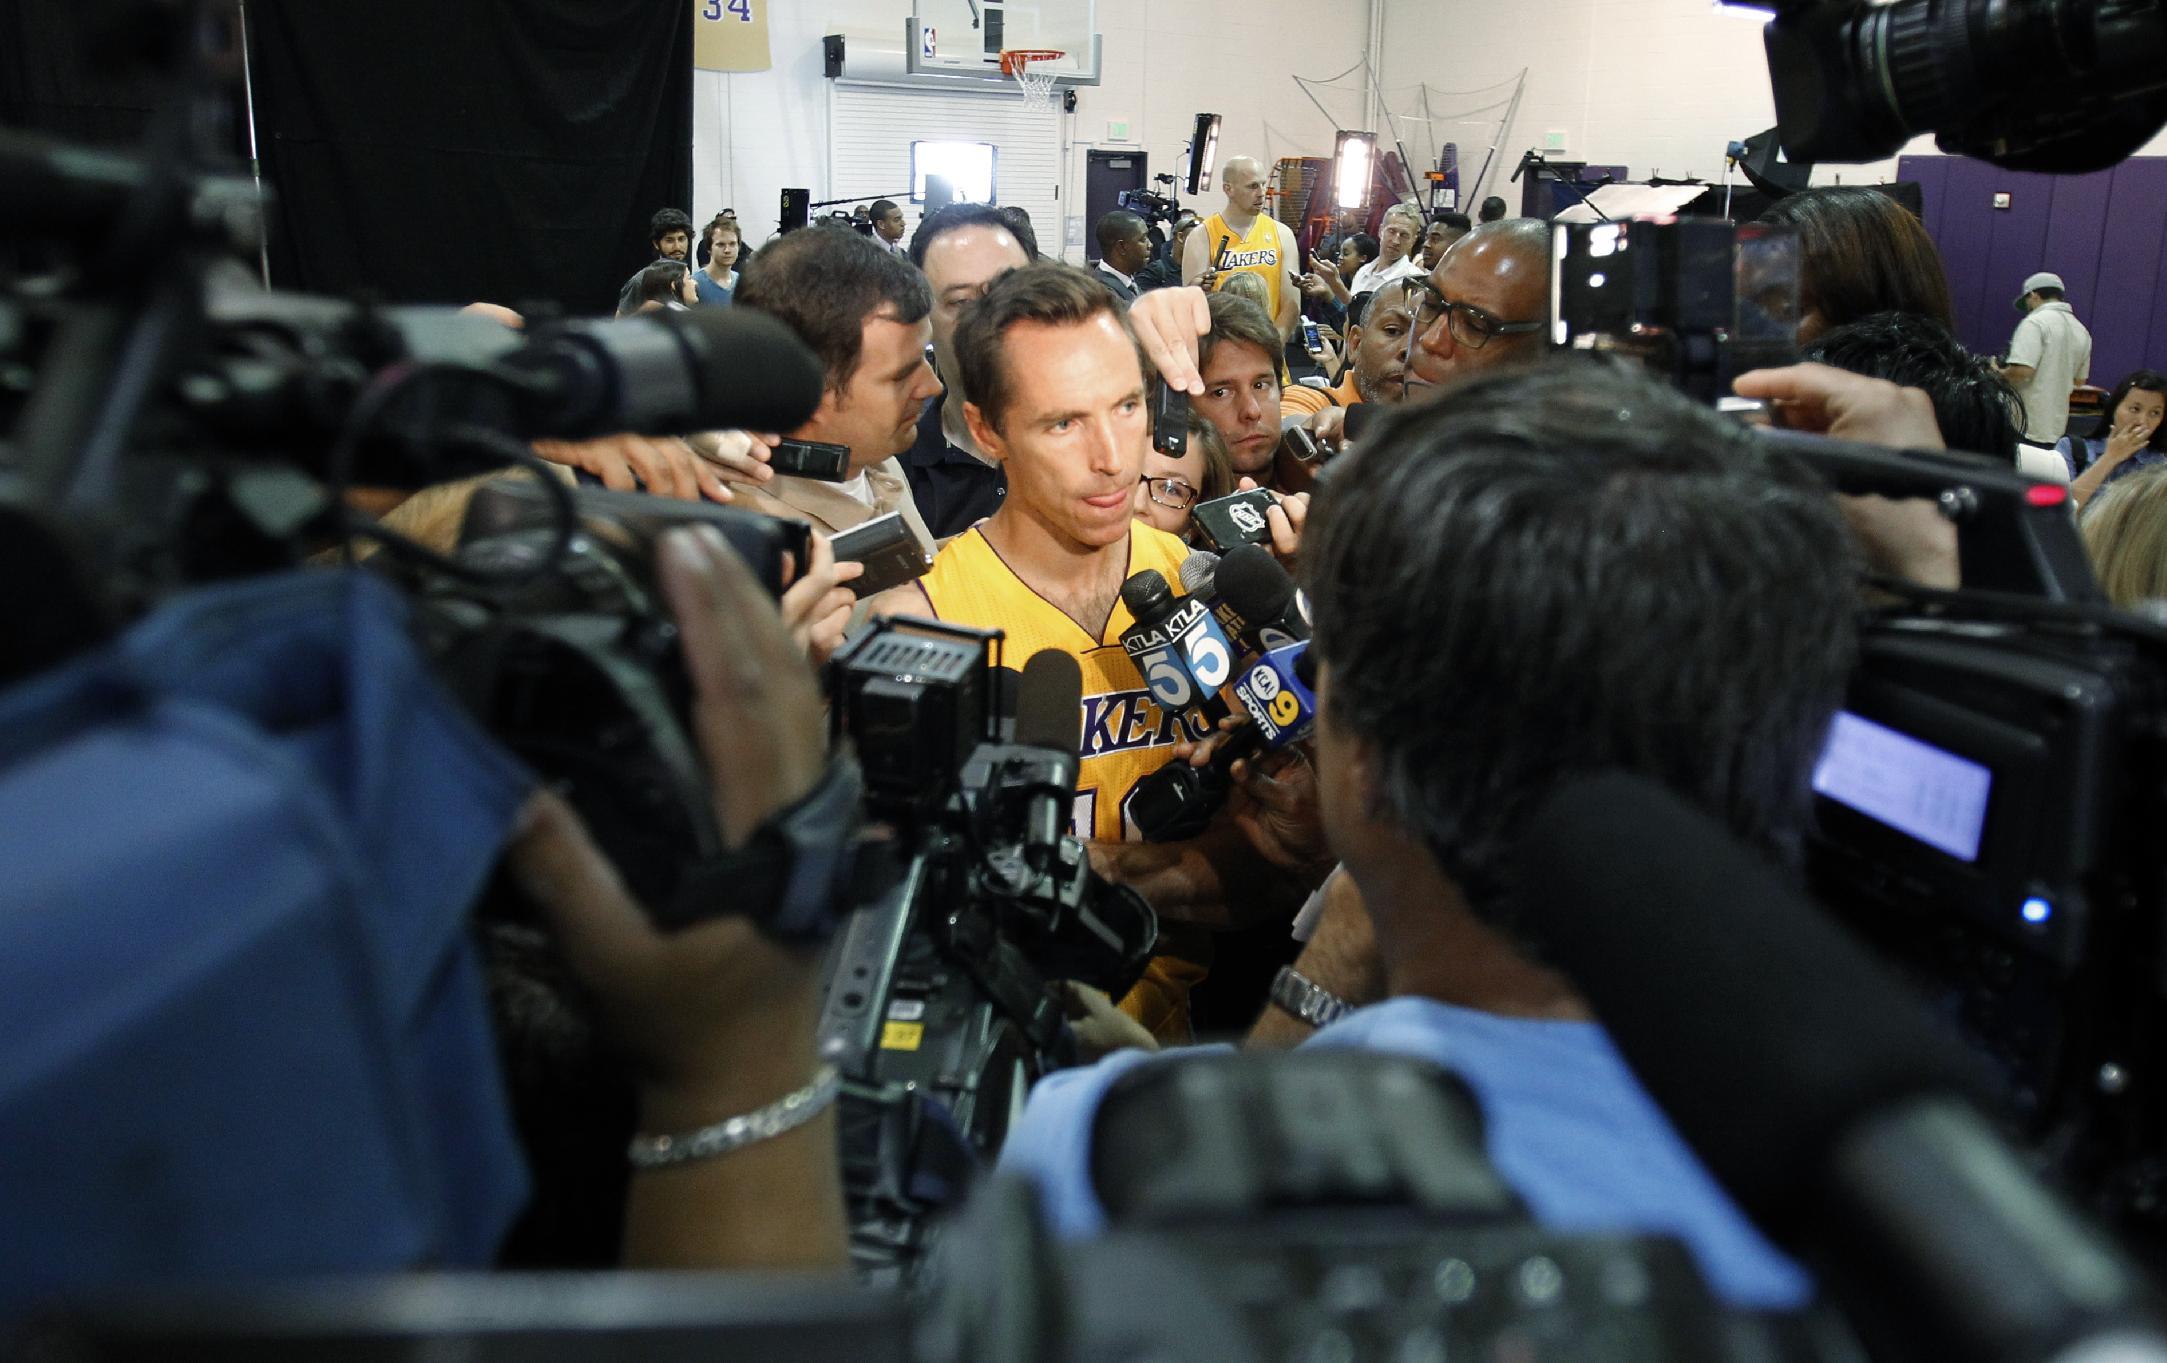 Lakers' Steve Nash angling for bounce-back season